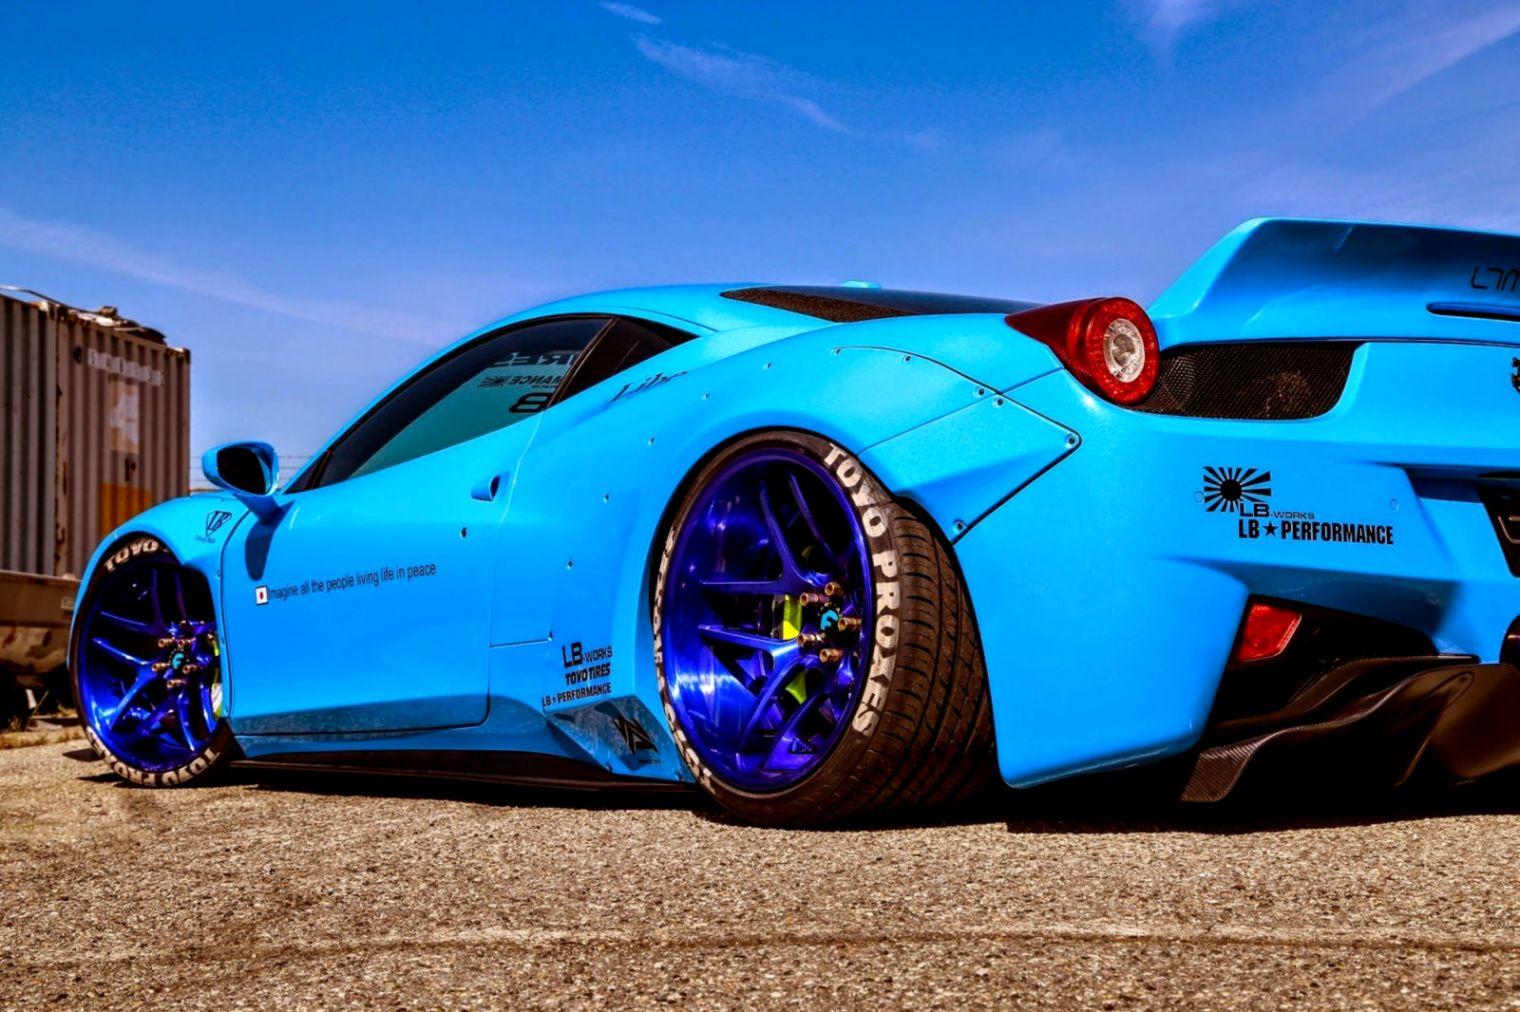 111 Ferrari 458 Italia Hd Wallpapers Background Images Ferrari 458 Liberty Walk Blue 109786 Hd Wallpaper Backgrounds Download